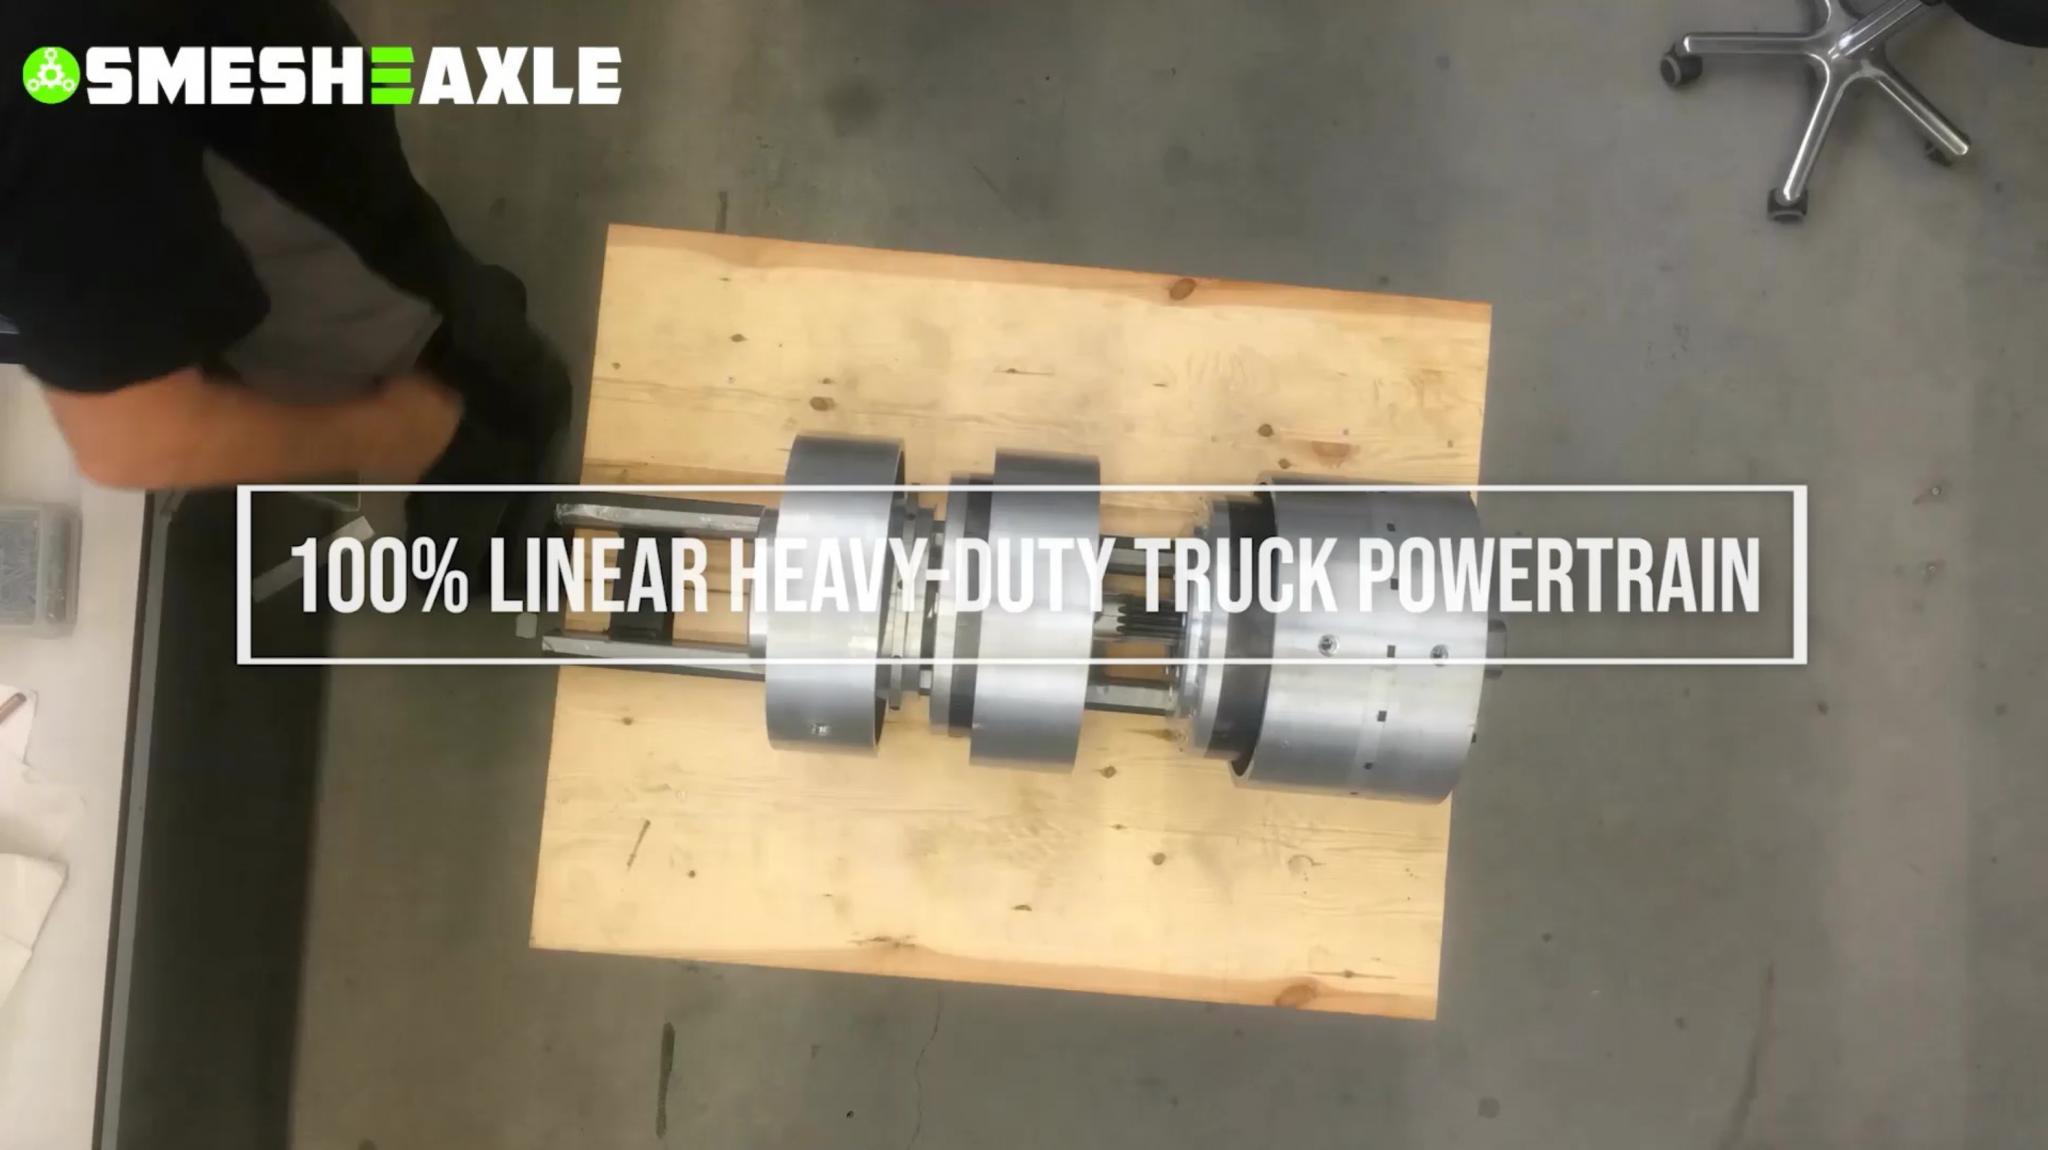 Assembling test of world's first 100% linear heavy-duty truck e-powertrain.